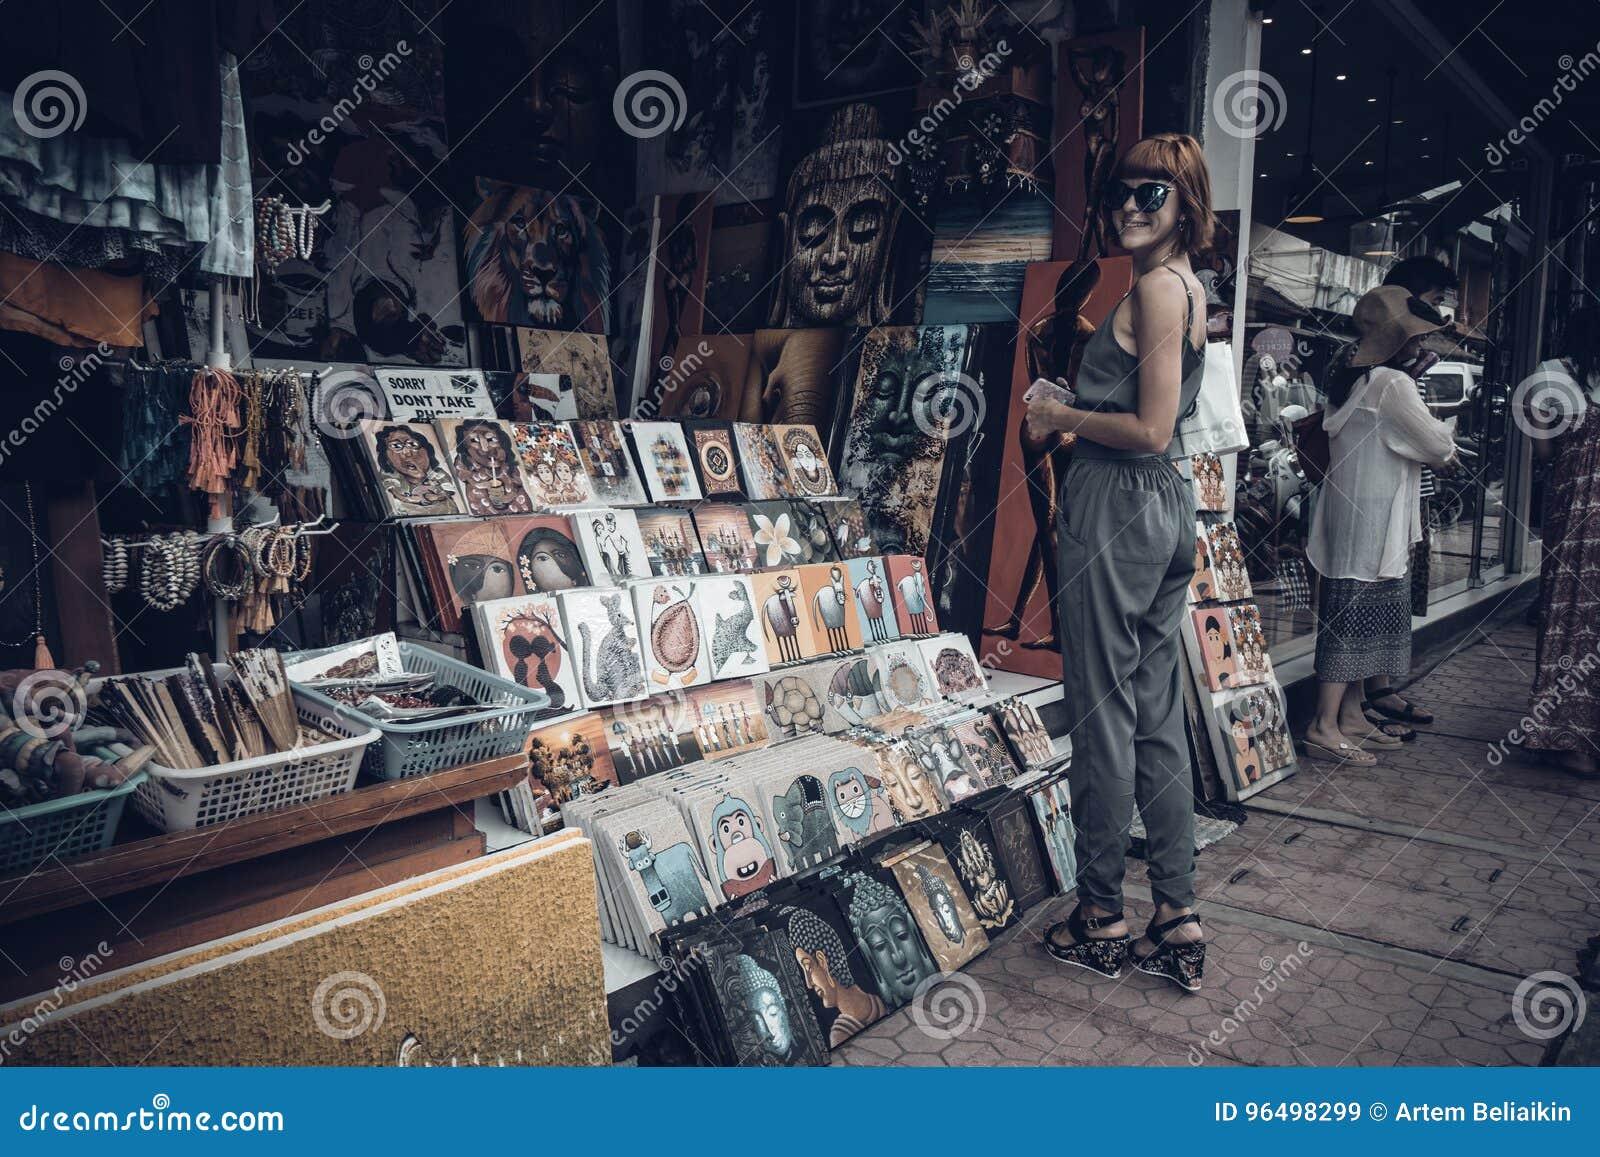 BALI, INDONESIA -JANUARY 1, 2017: Young woman on the souvenir street of Ubud, Bali, Indonesia.